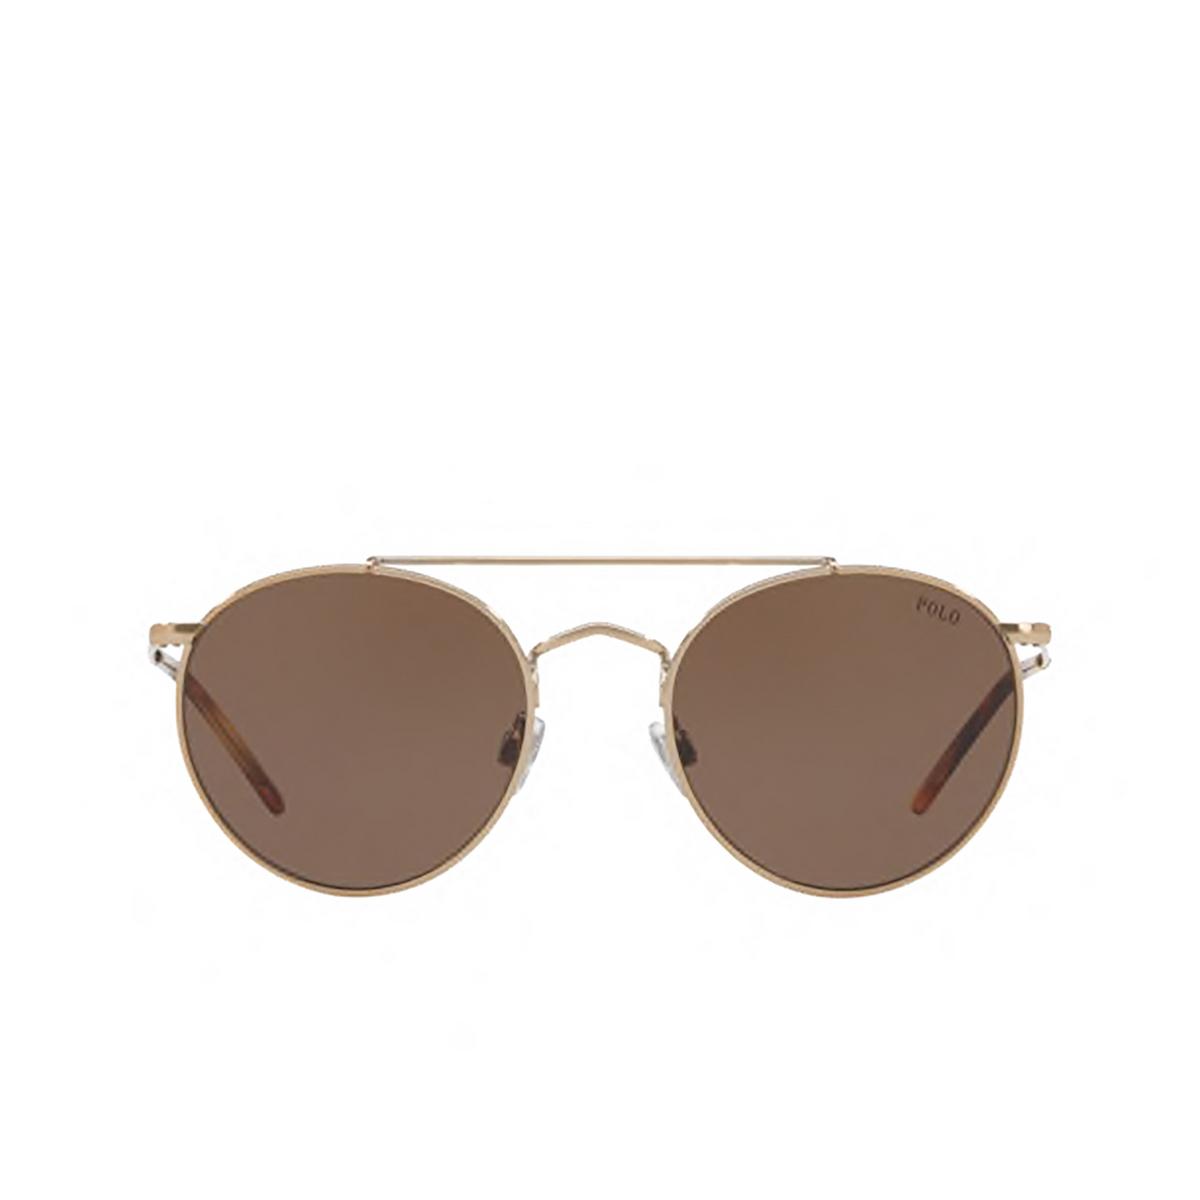 Polo Ralph Lauren® Round Sunglasses: PH3114 color 9334/73.